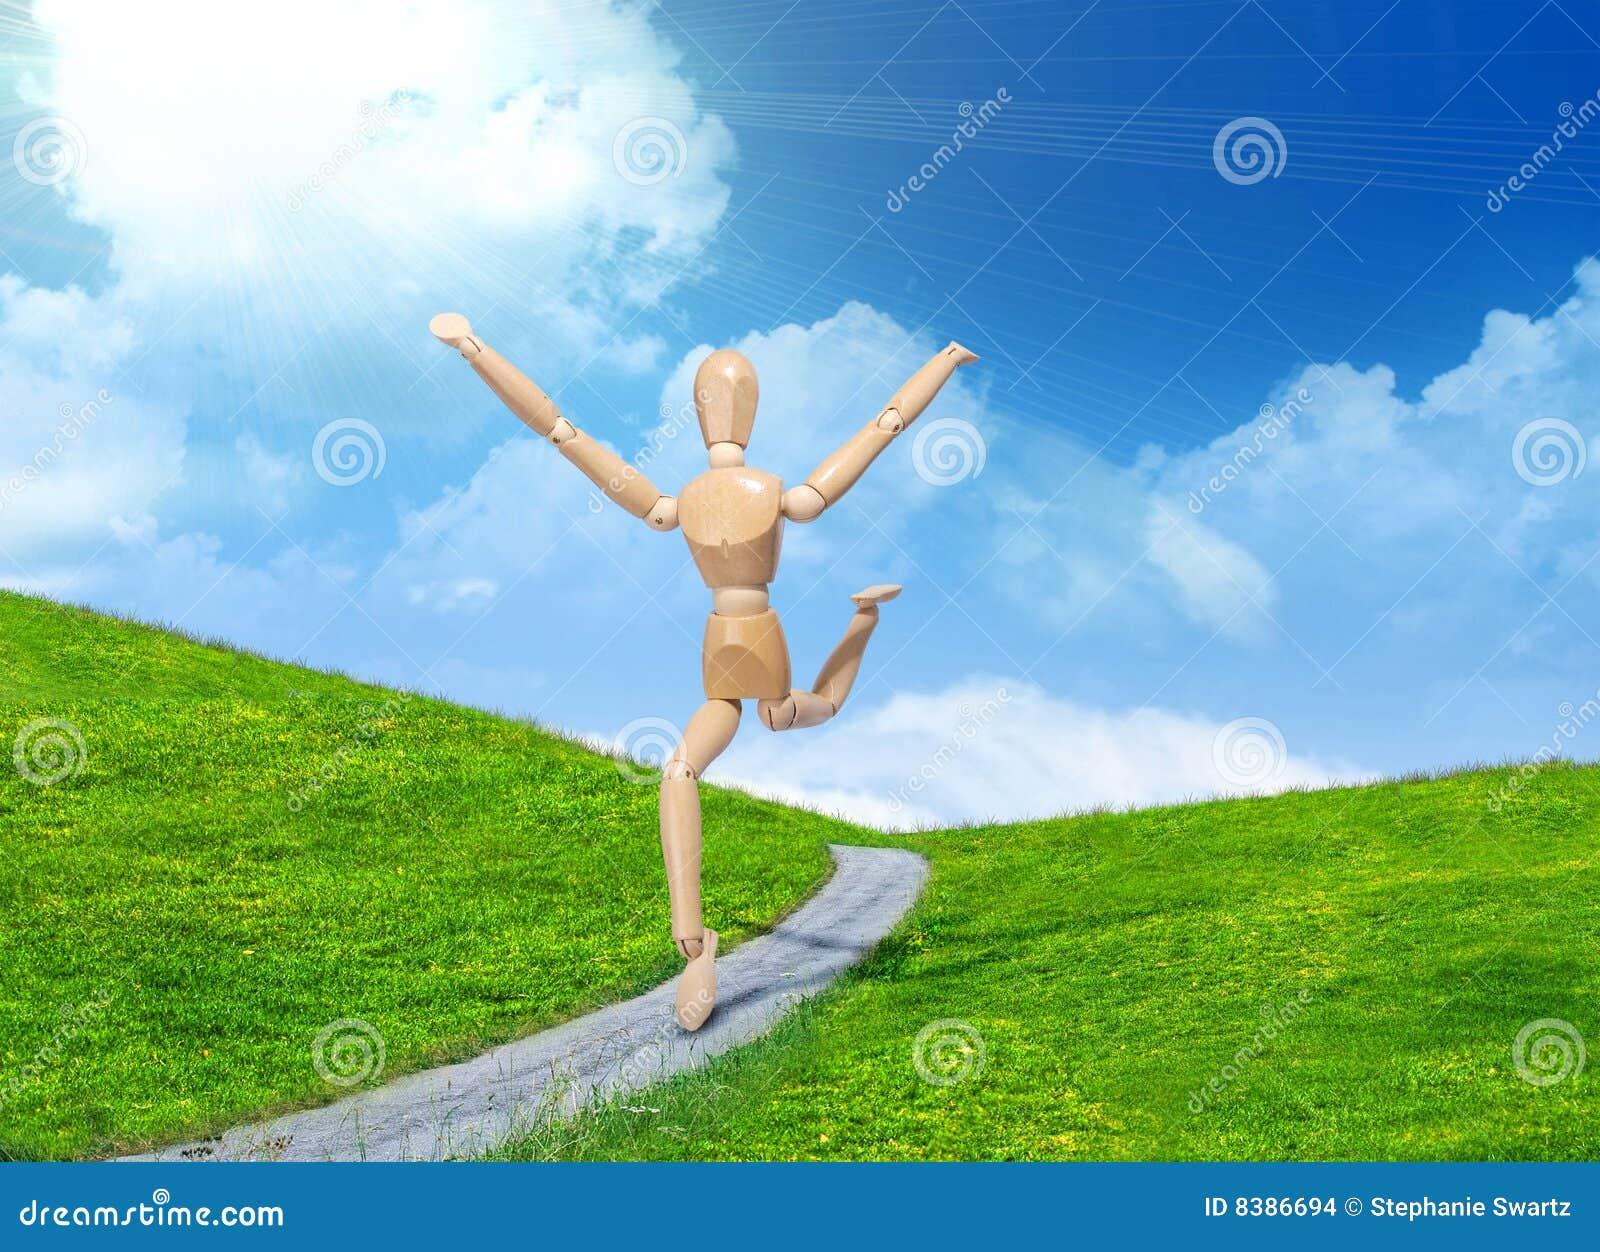 Wooden man running